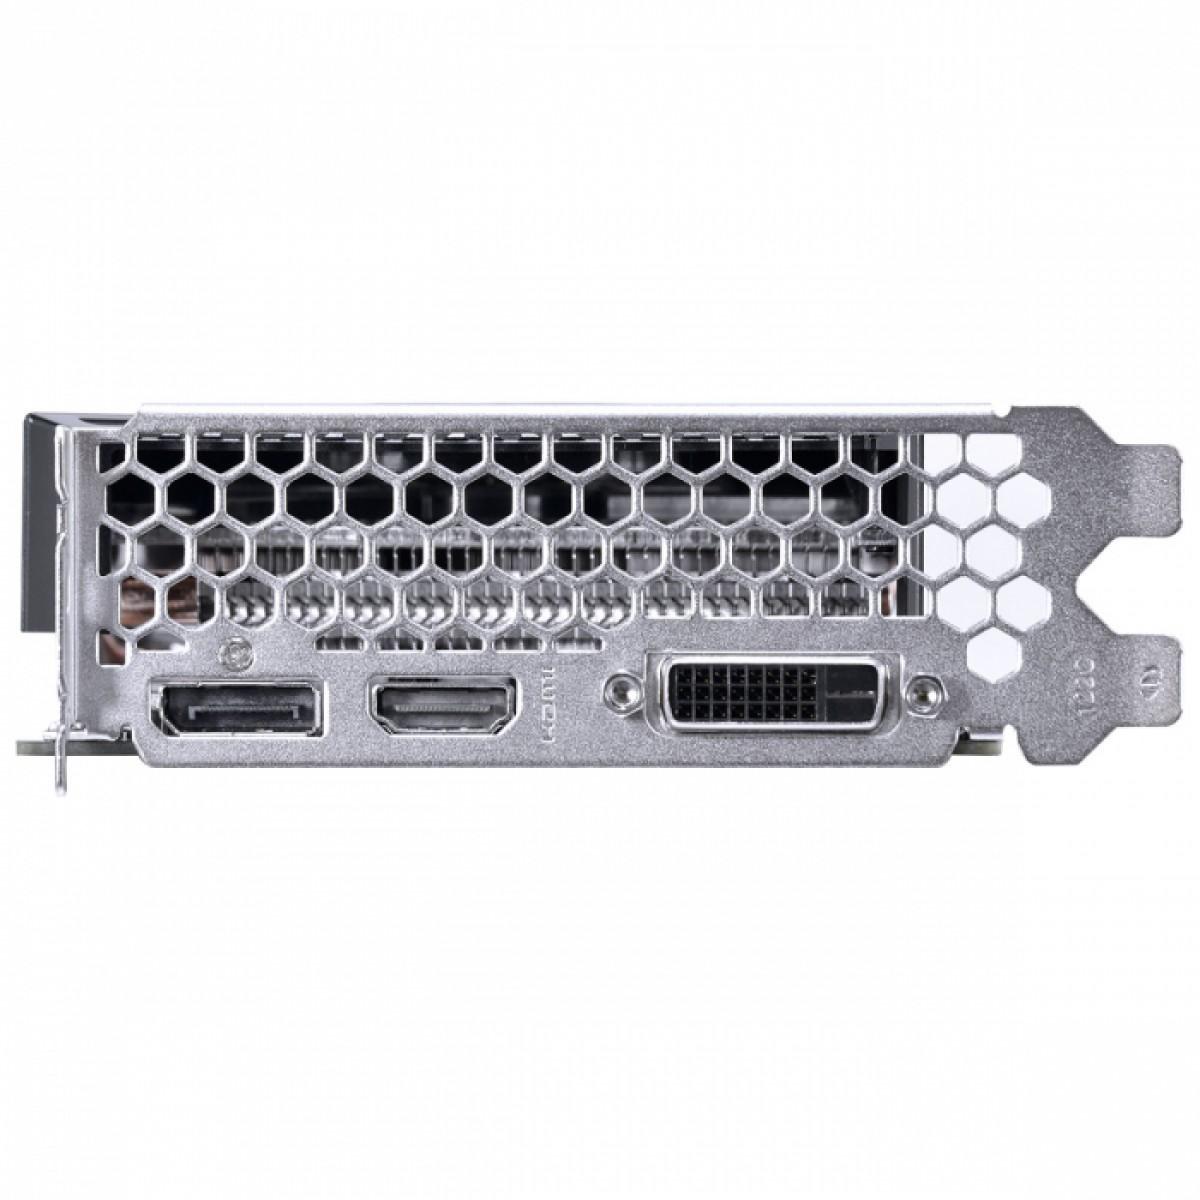 PLACA DE VIDEO NVIDIA RTX 2060 OC DUAL FAN GRAFFITI 6GB GDDR6 PPGF2060DR6192 PCYES